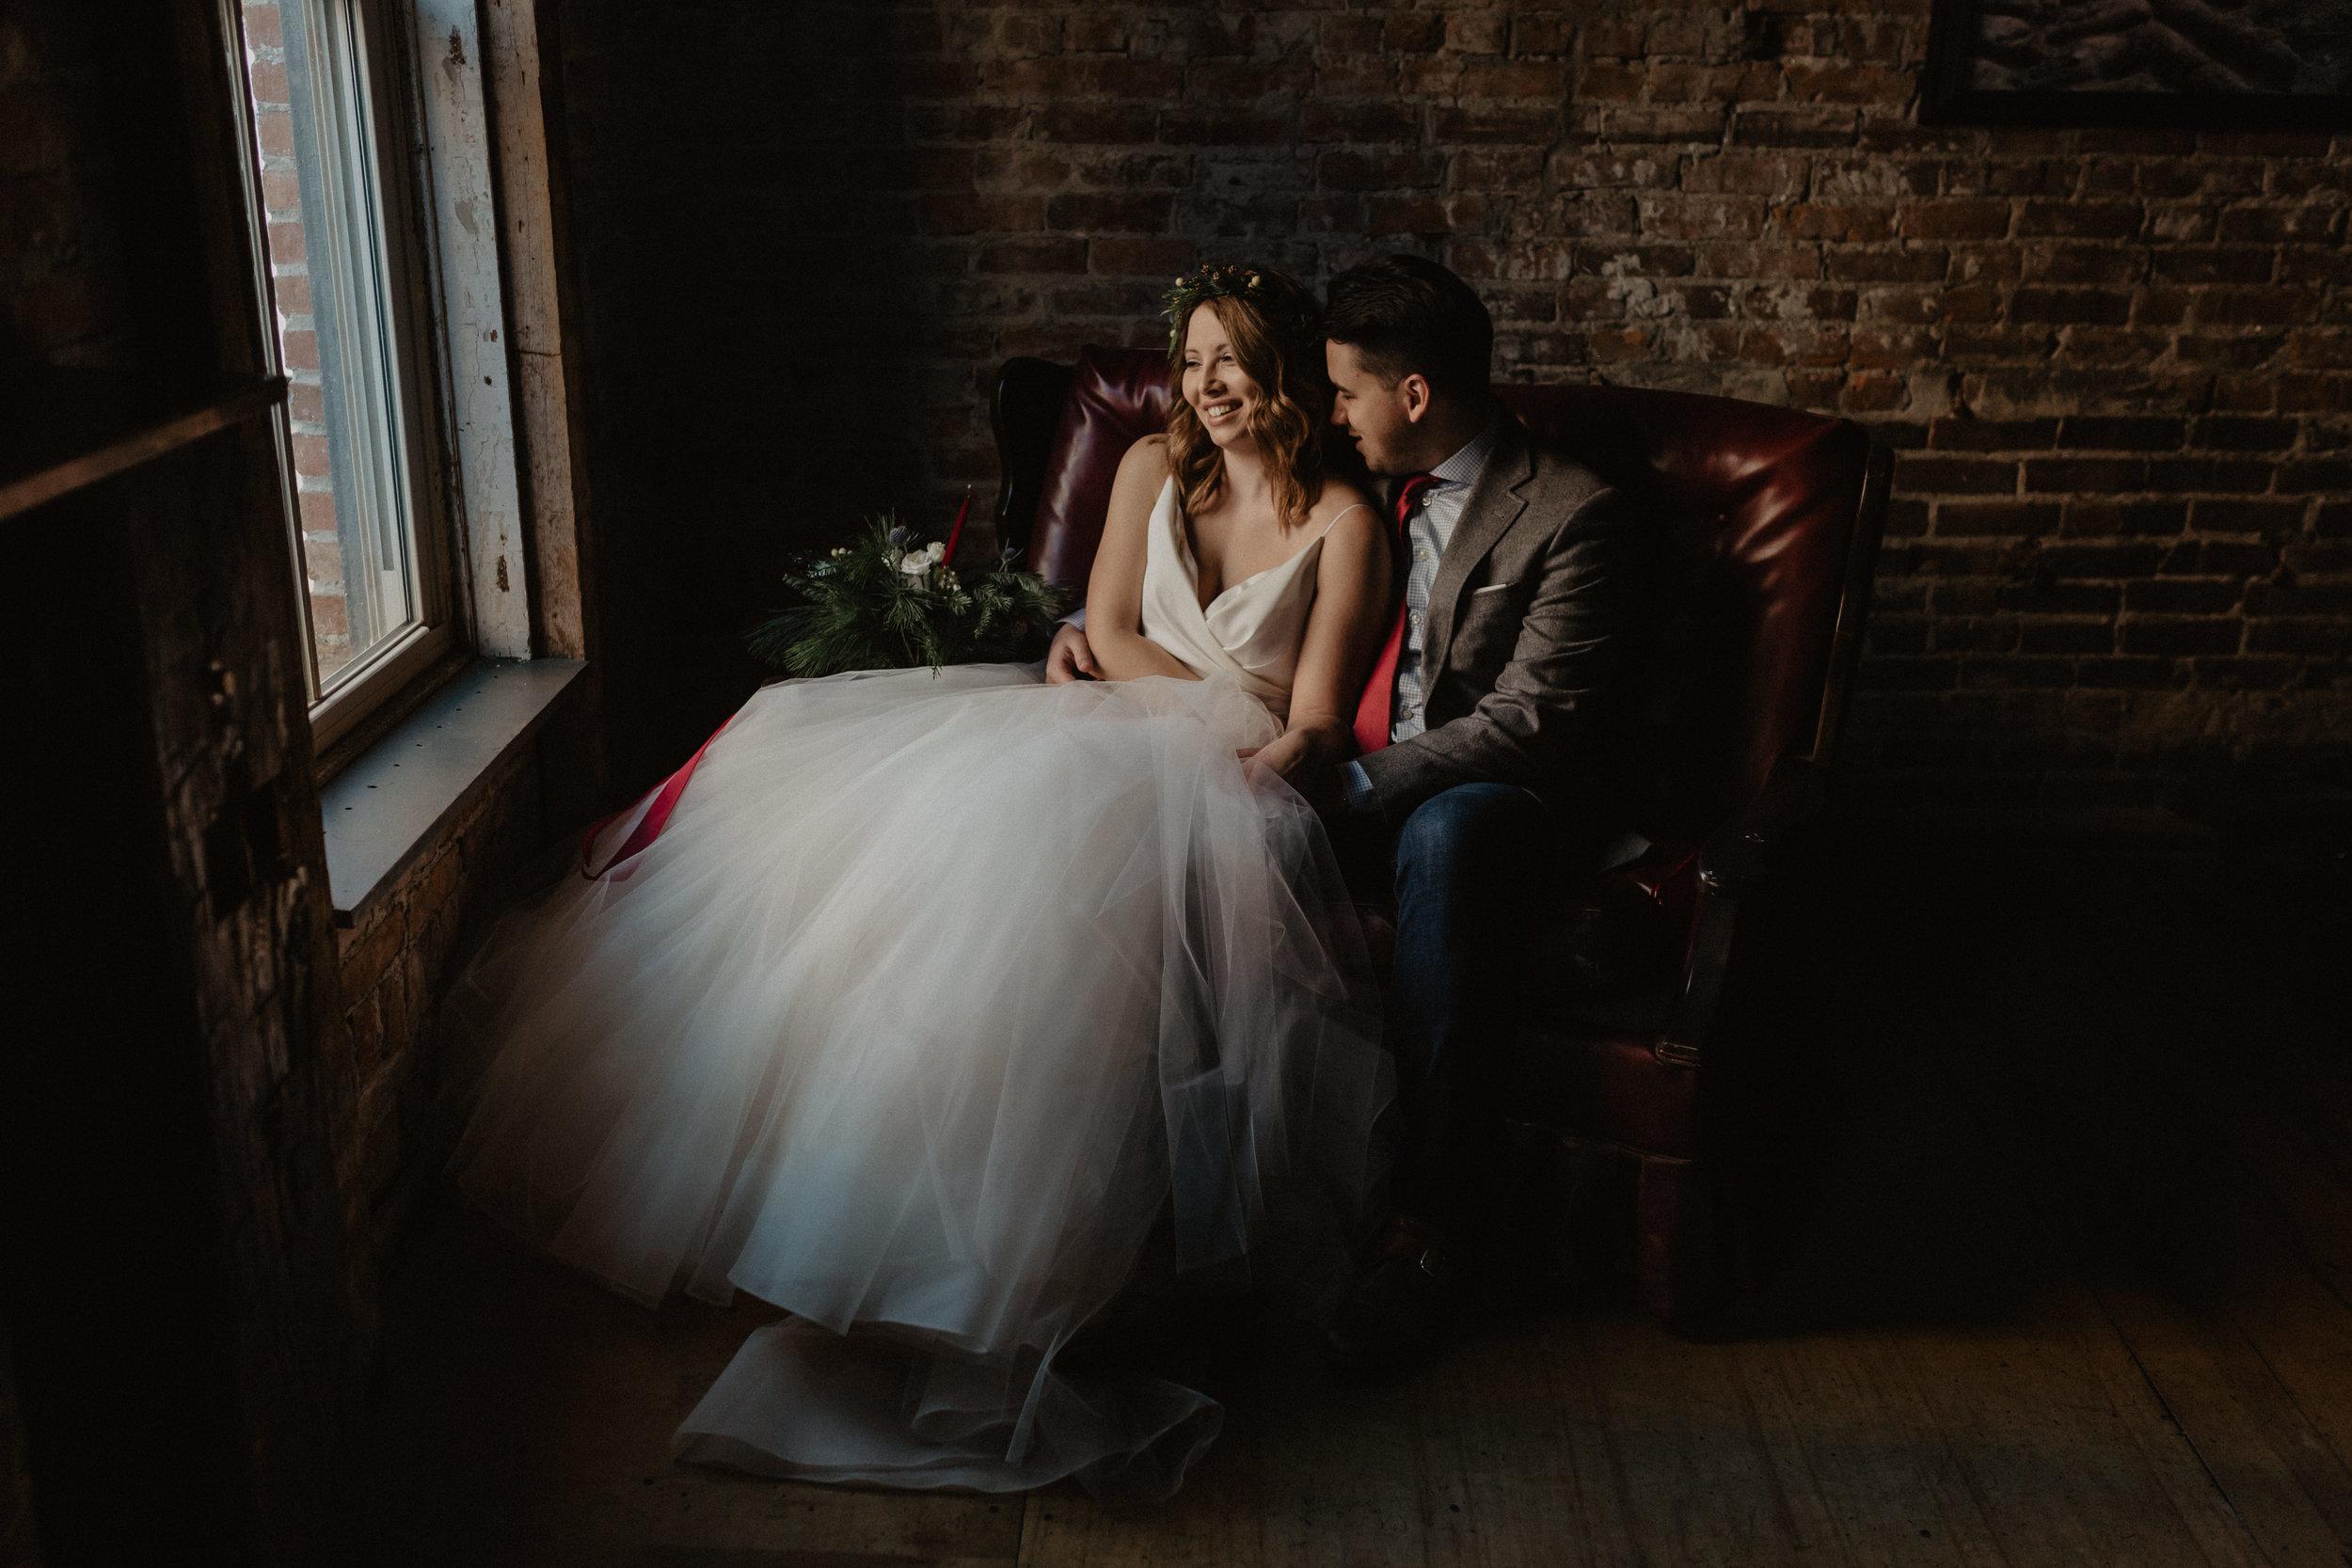 lucas_confectionery_wedding-30.jpg